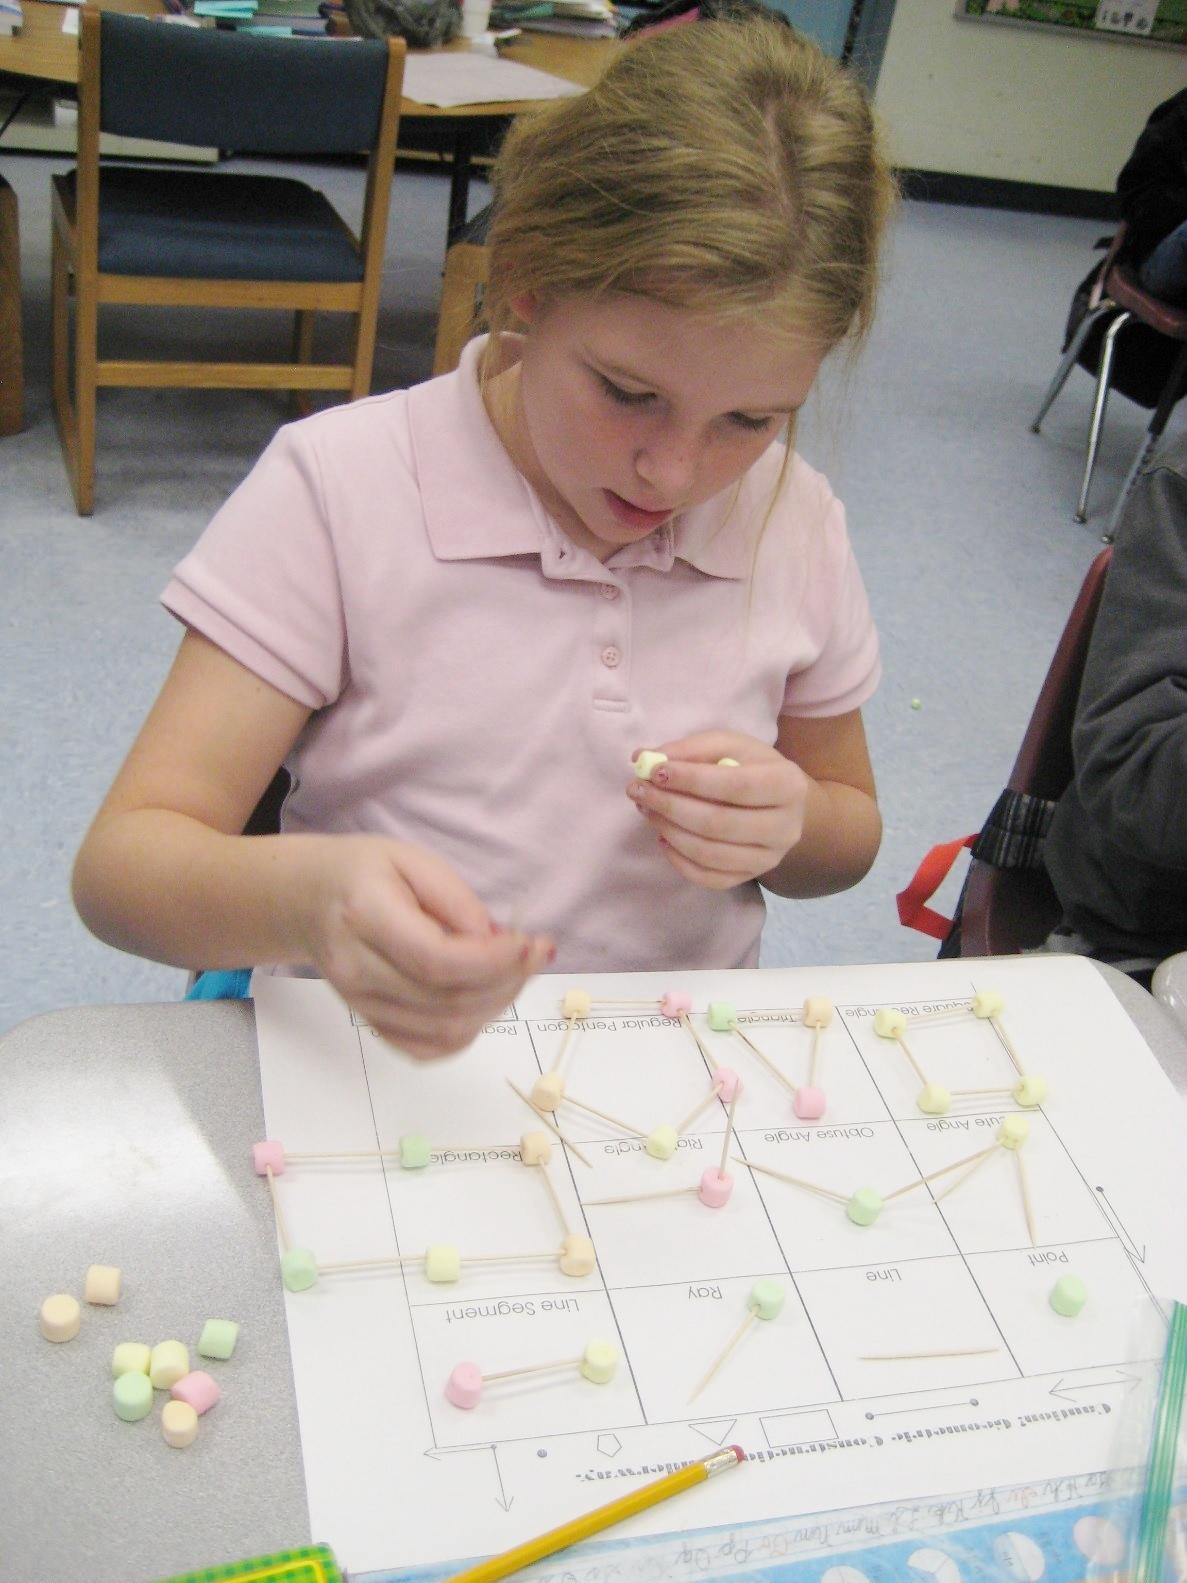 Mariposa Elementary students study geometry